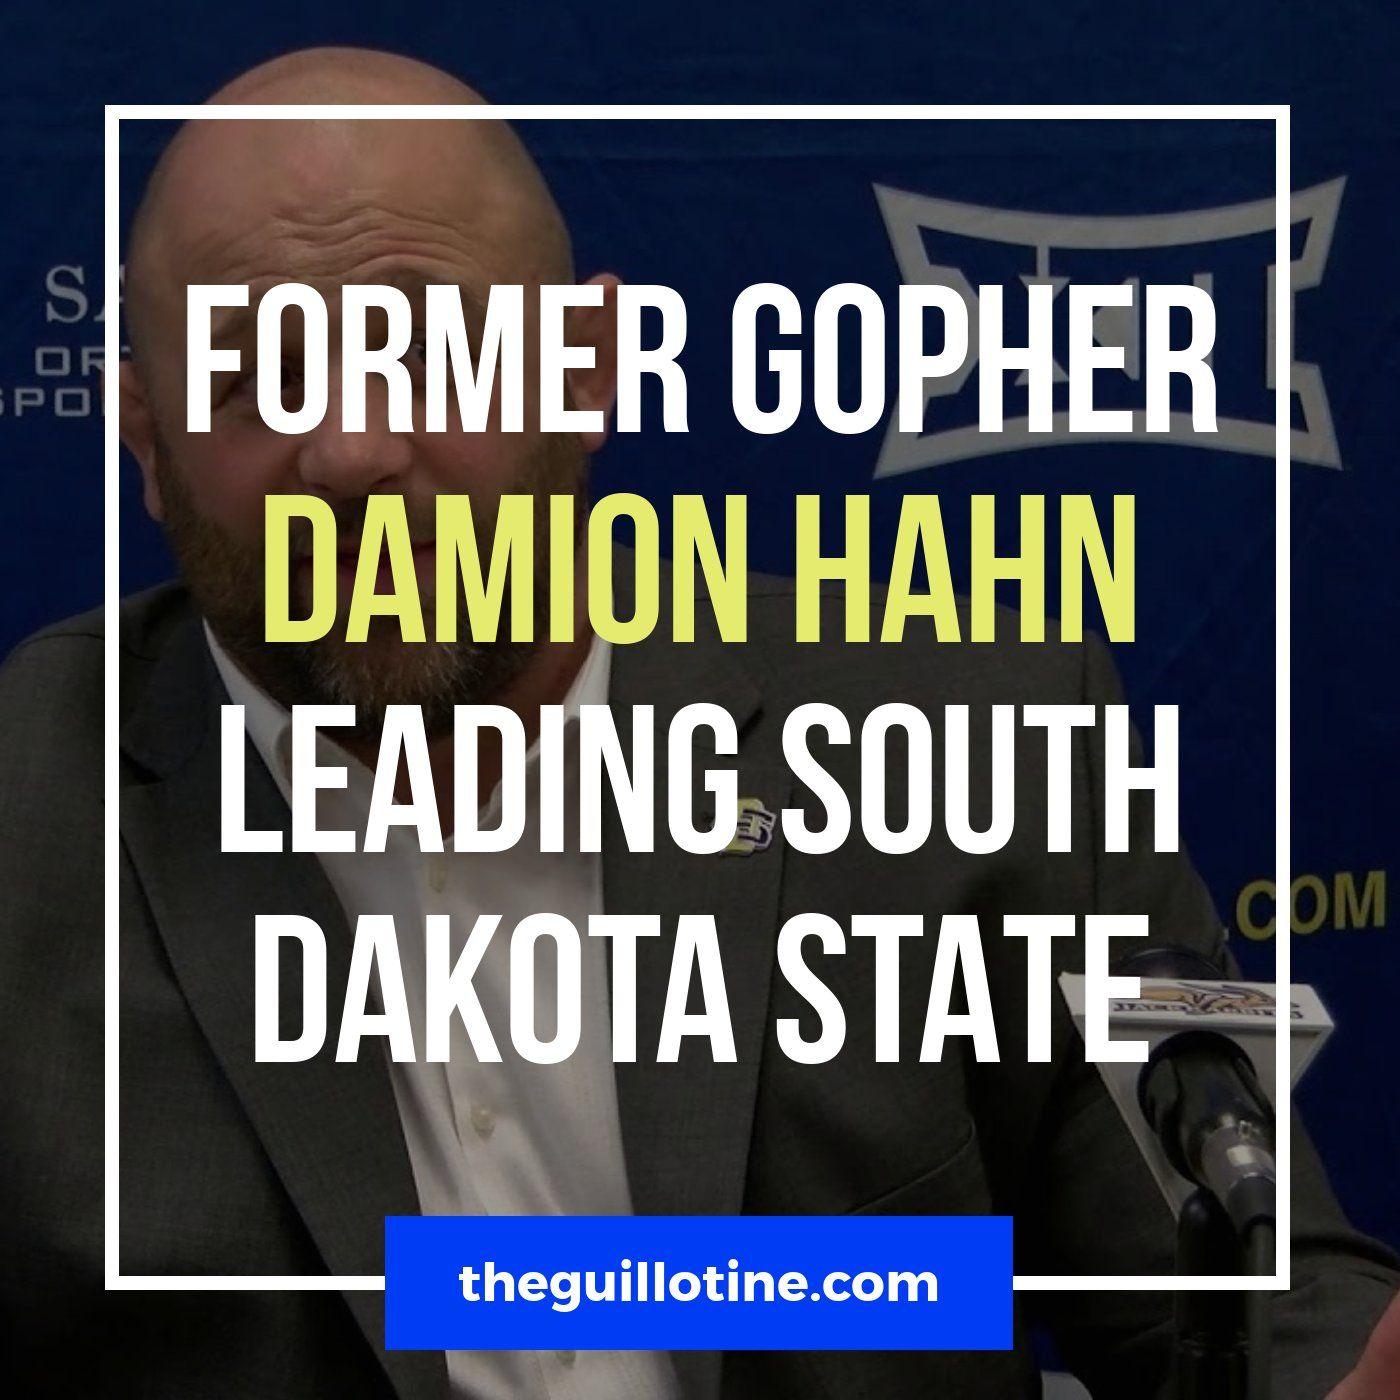 Former Gopher Damion Hahn now leading South Dakota State - GG51